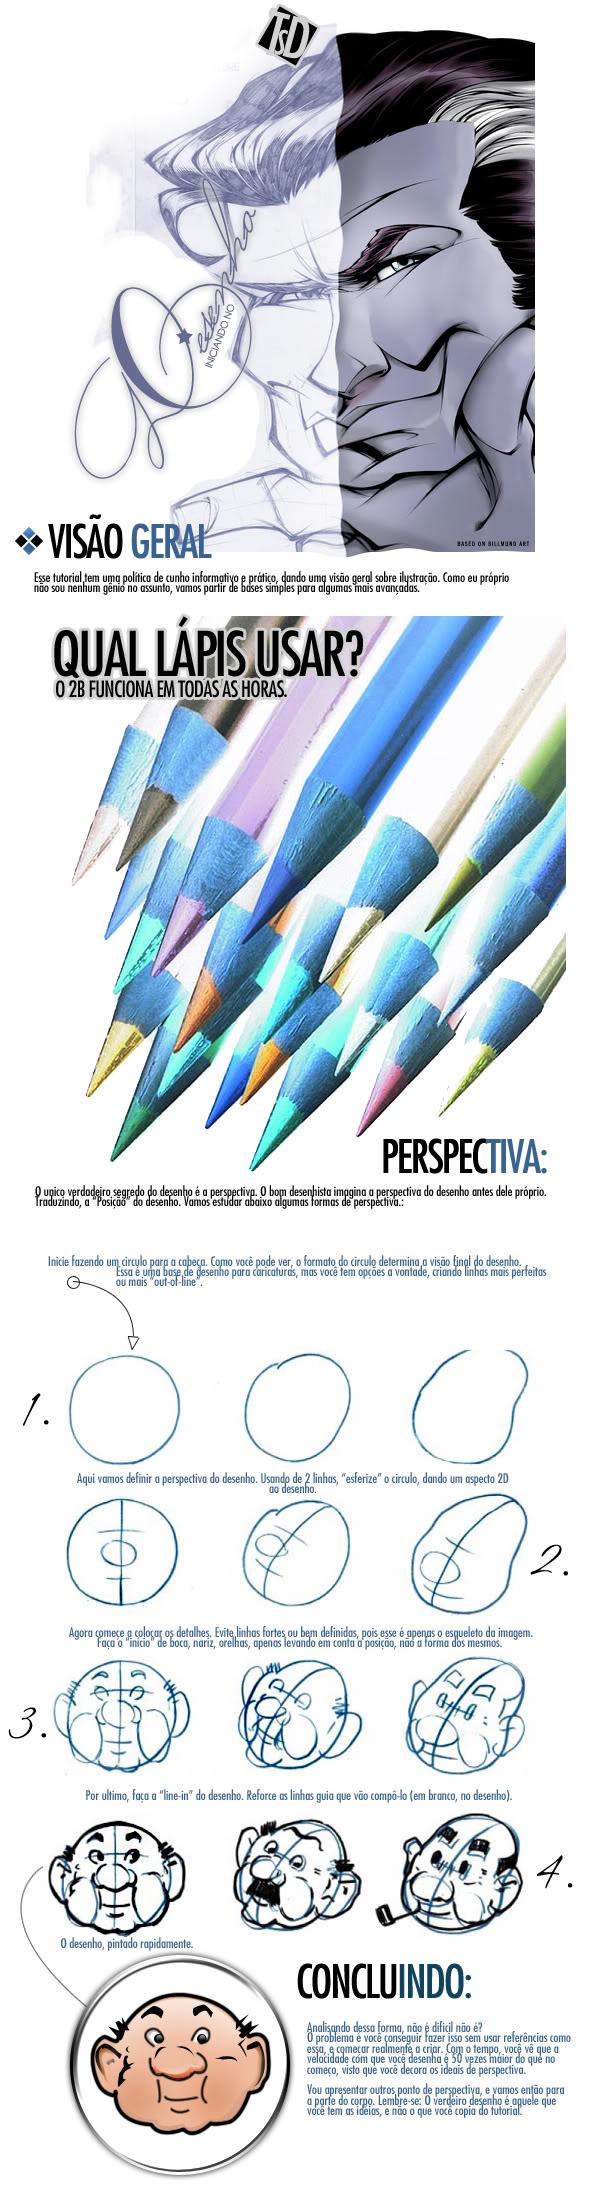 28/02 aprenda a desenhar (parte 01) Caric1-Yart